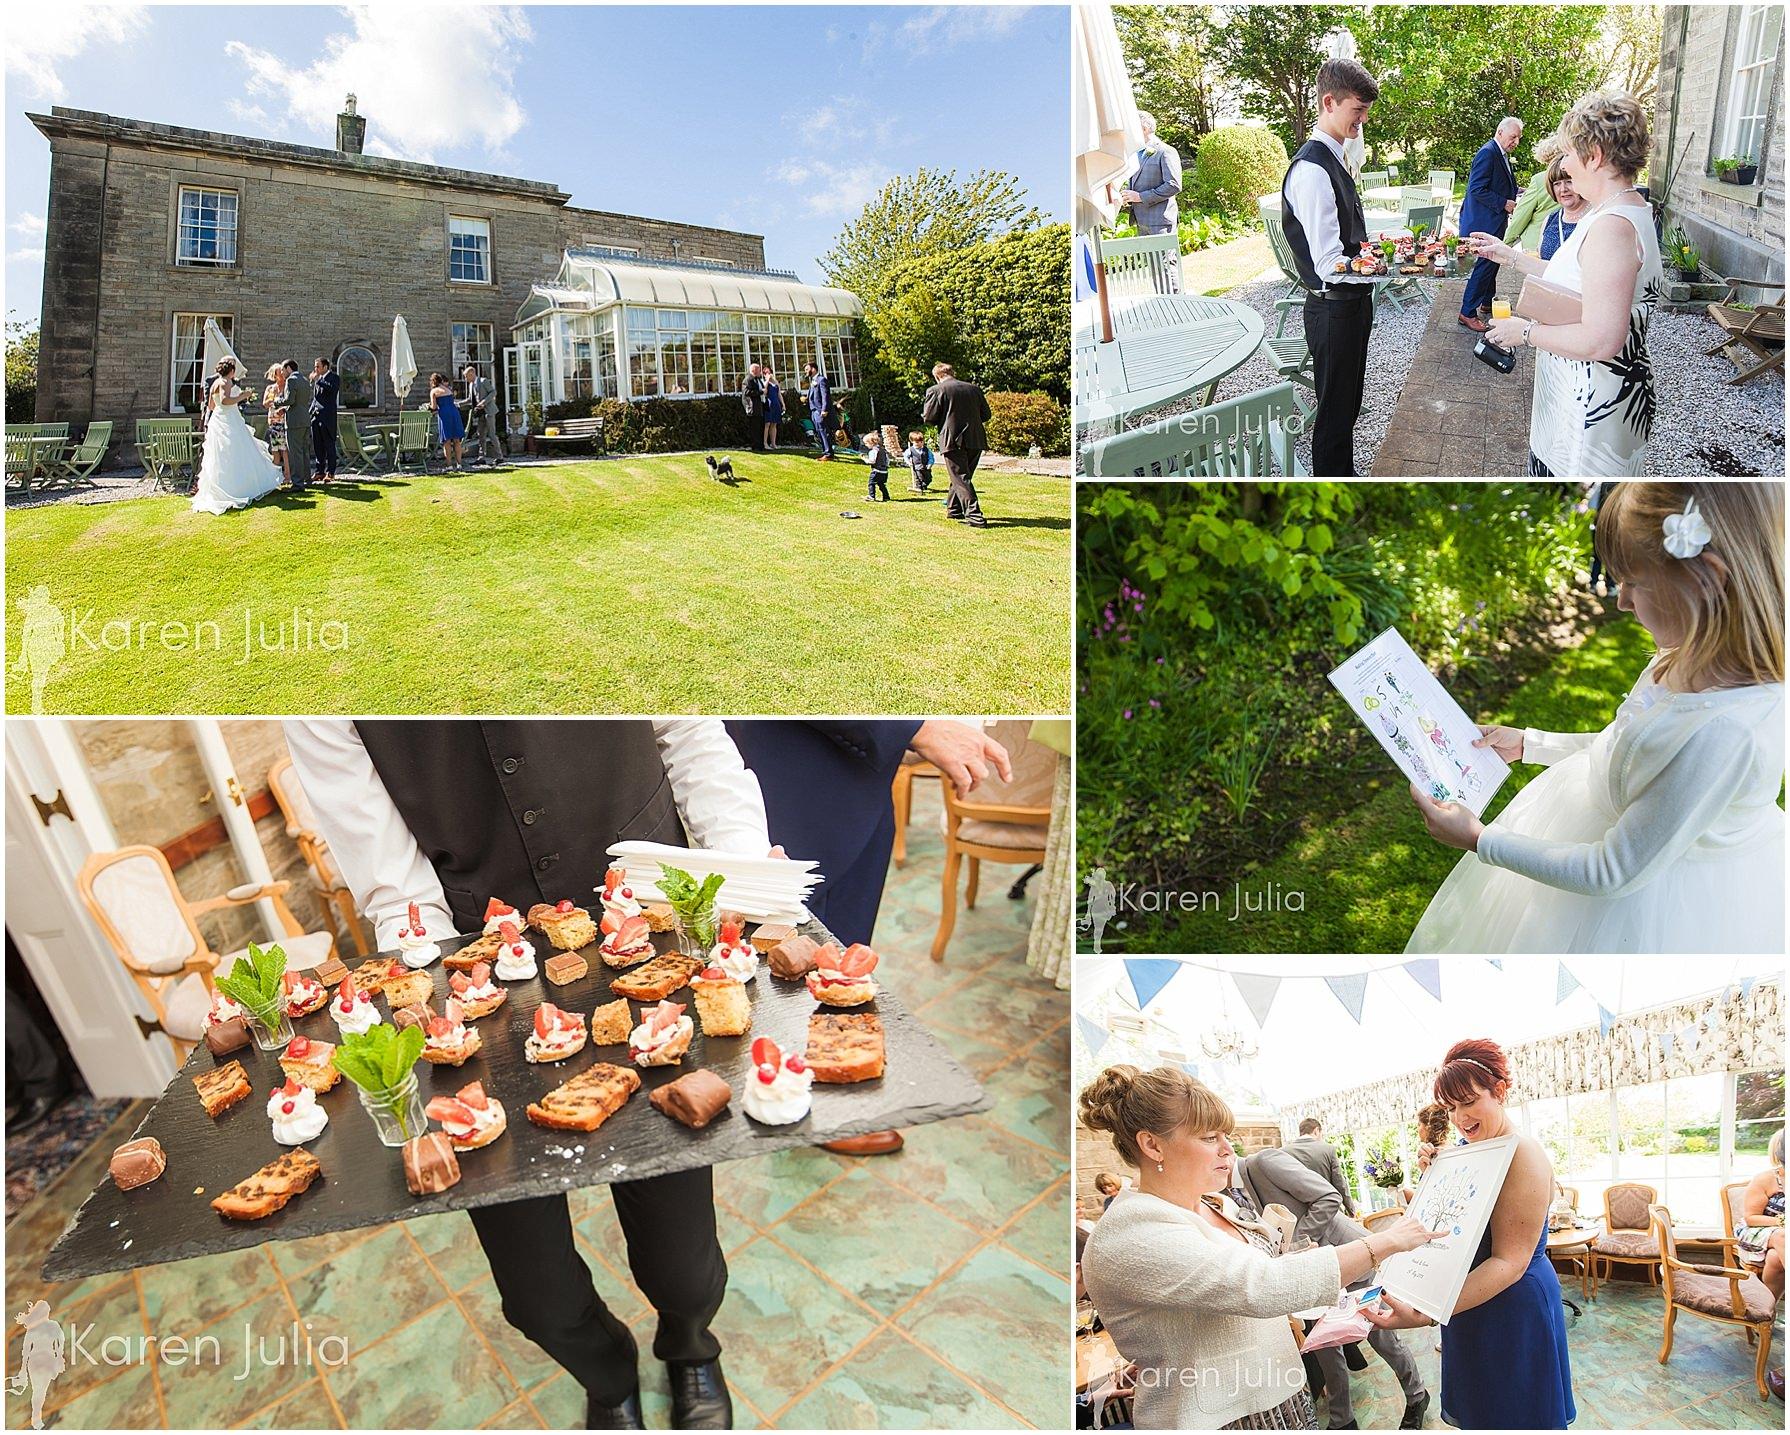 Spring-House-Hotel-Wedding-Photography-09